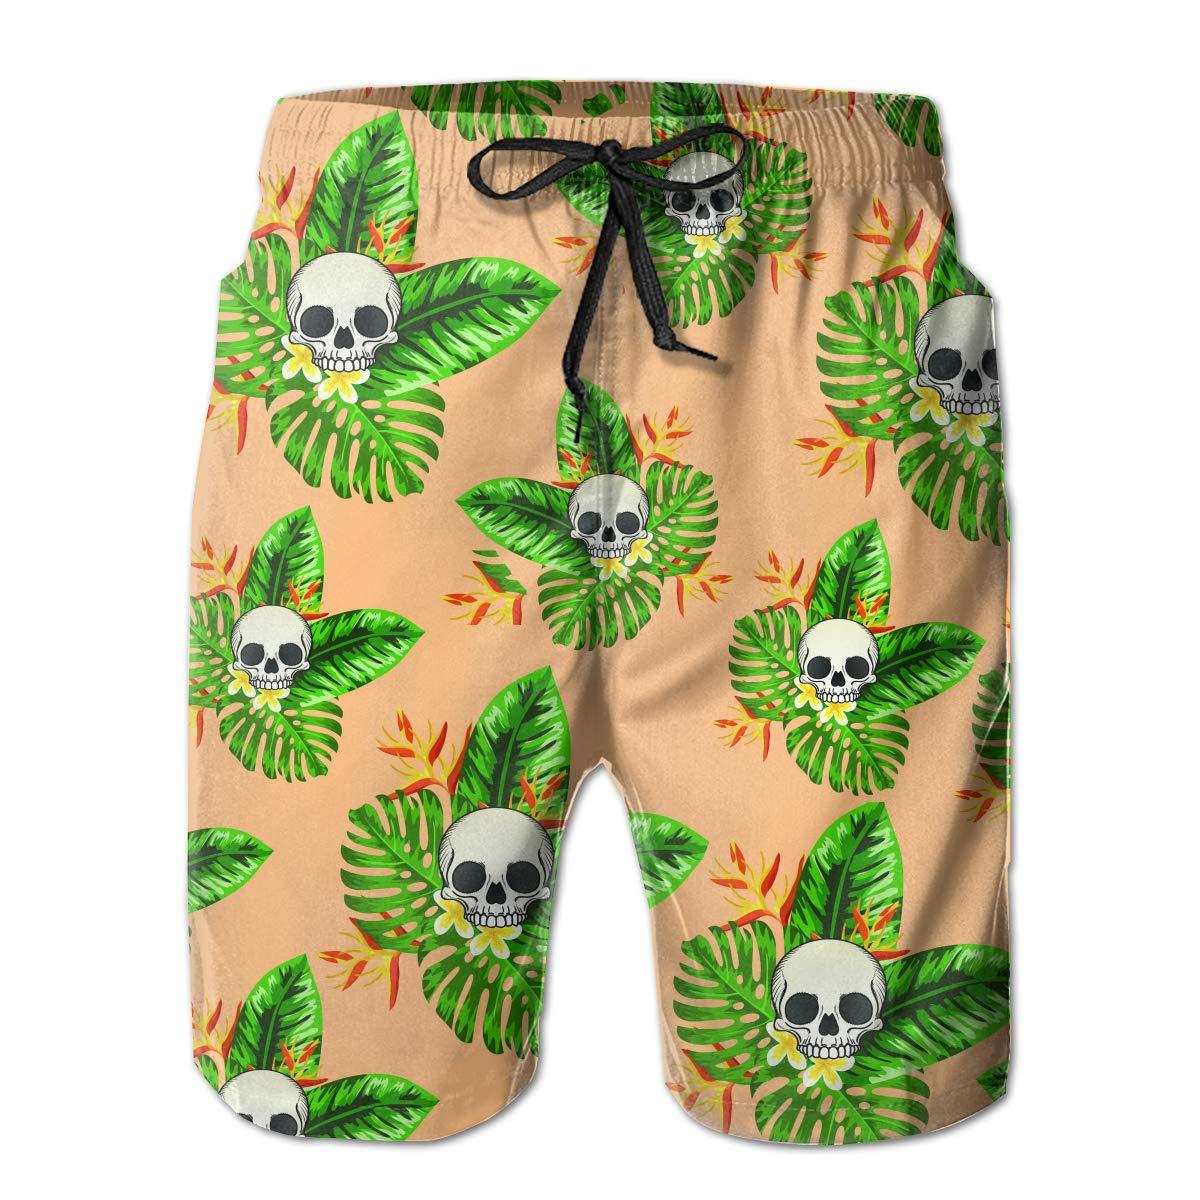 FRS Ltd Skulls Leaves Mens Quick Dry Swim Trunks Beach Board Short Drawstring Casual Athletic Shorts